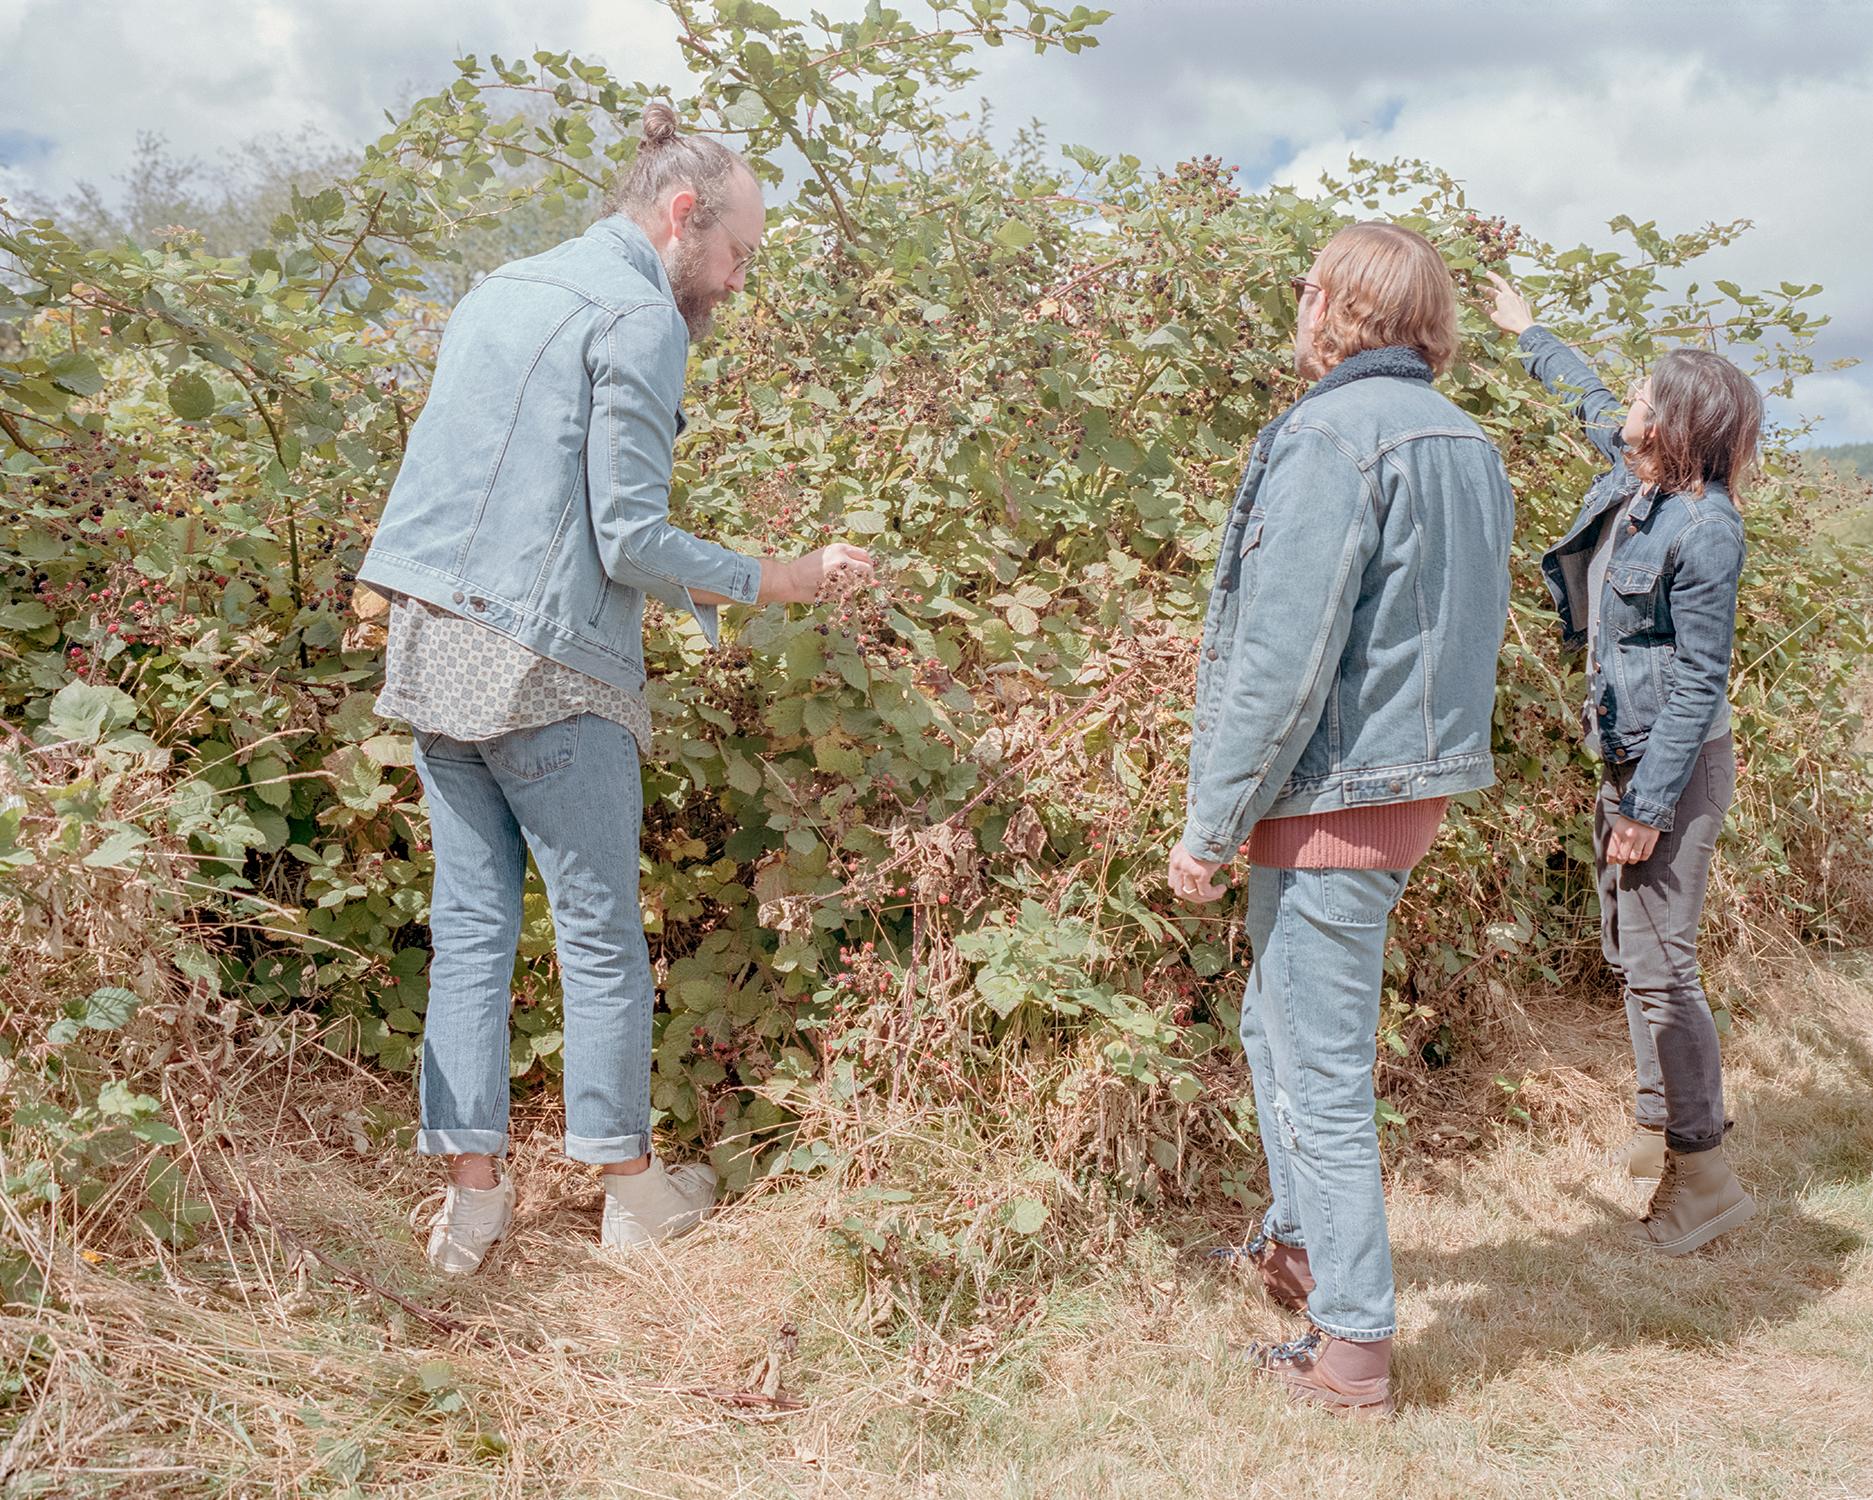 Berry picking in all denim/Raymond WA - September 2018